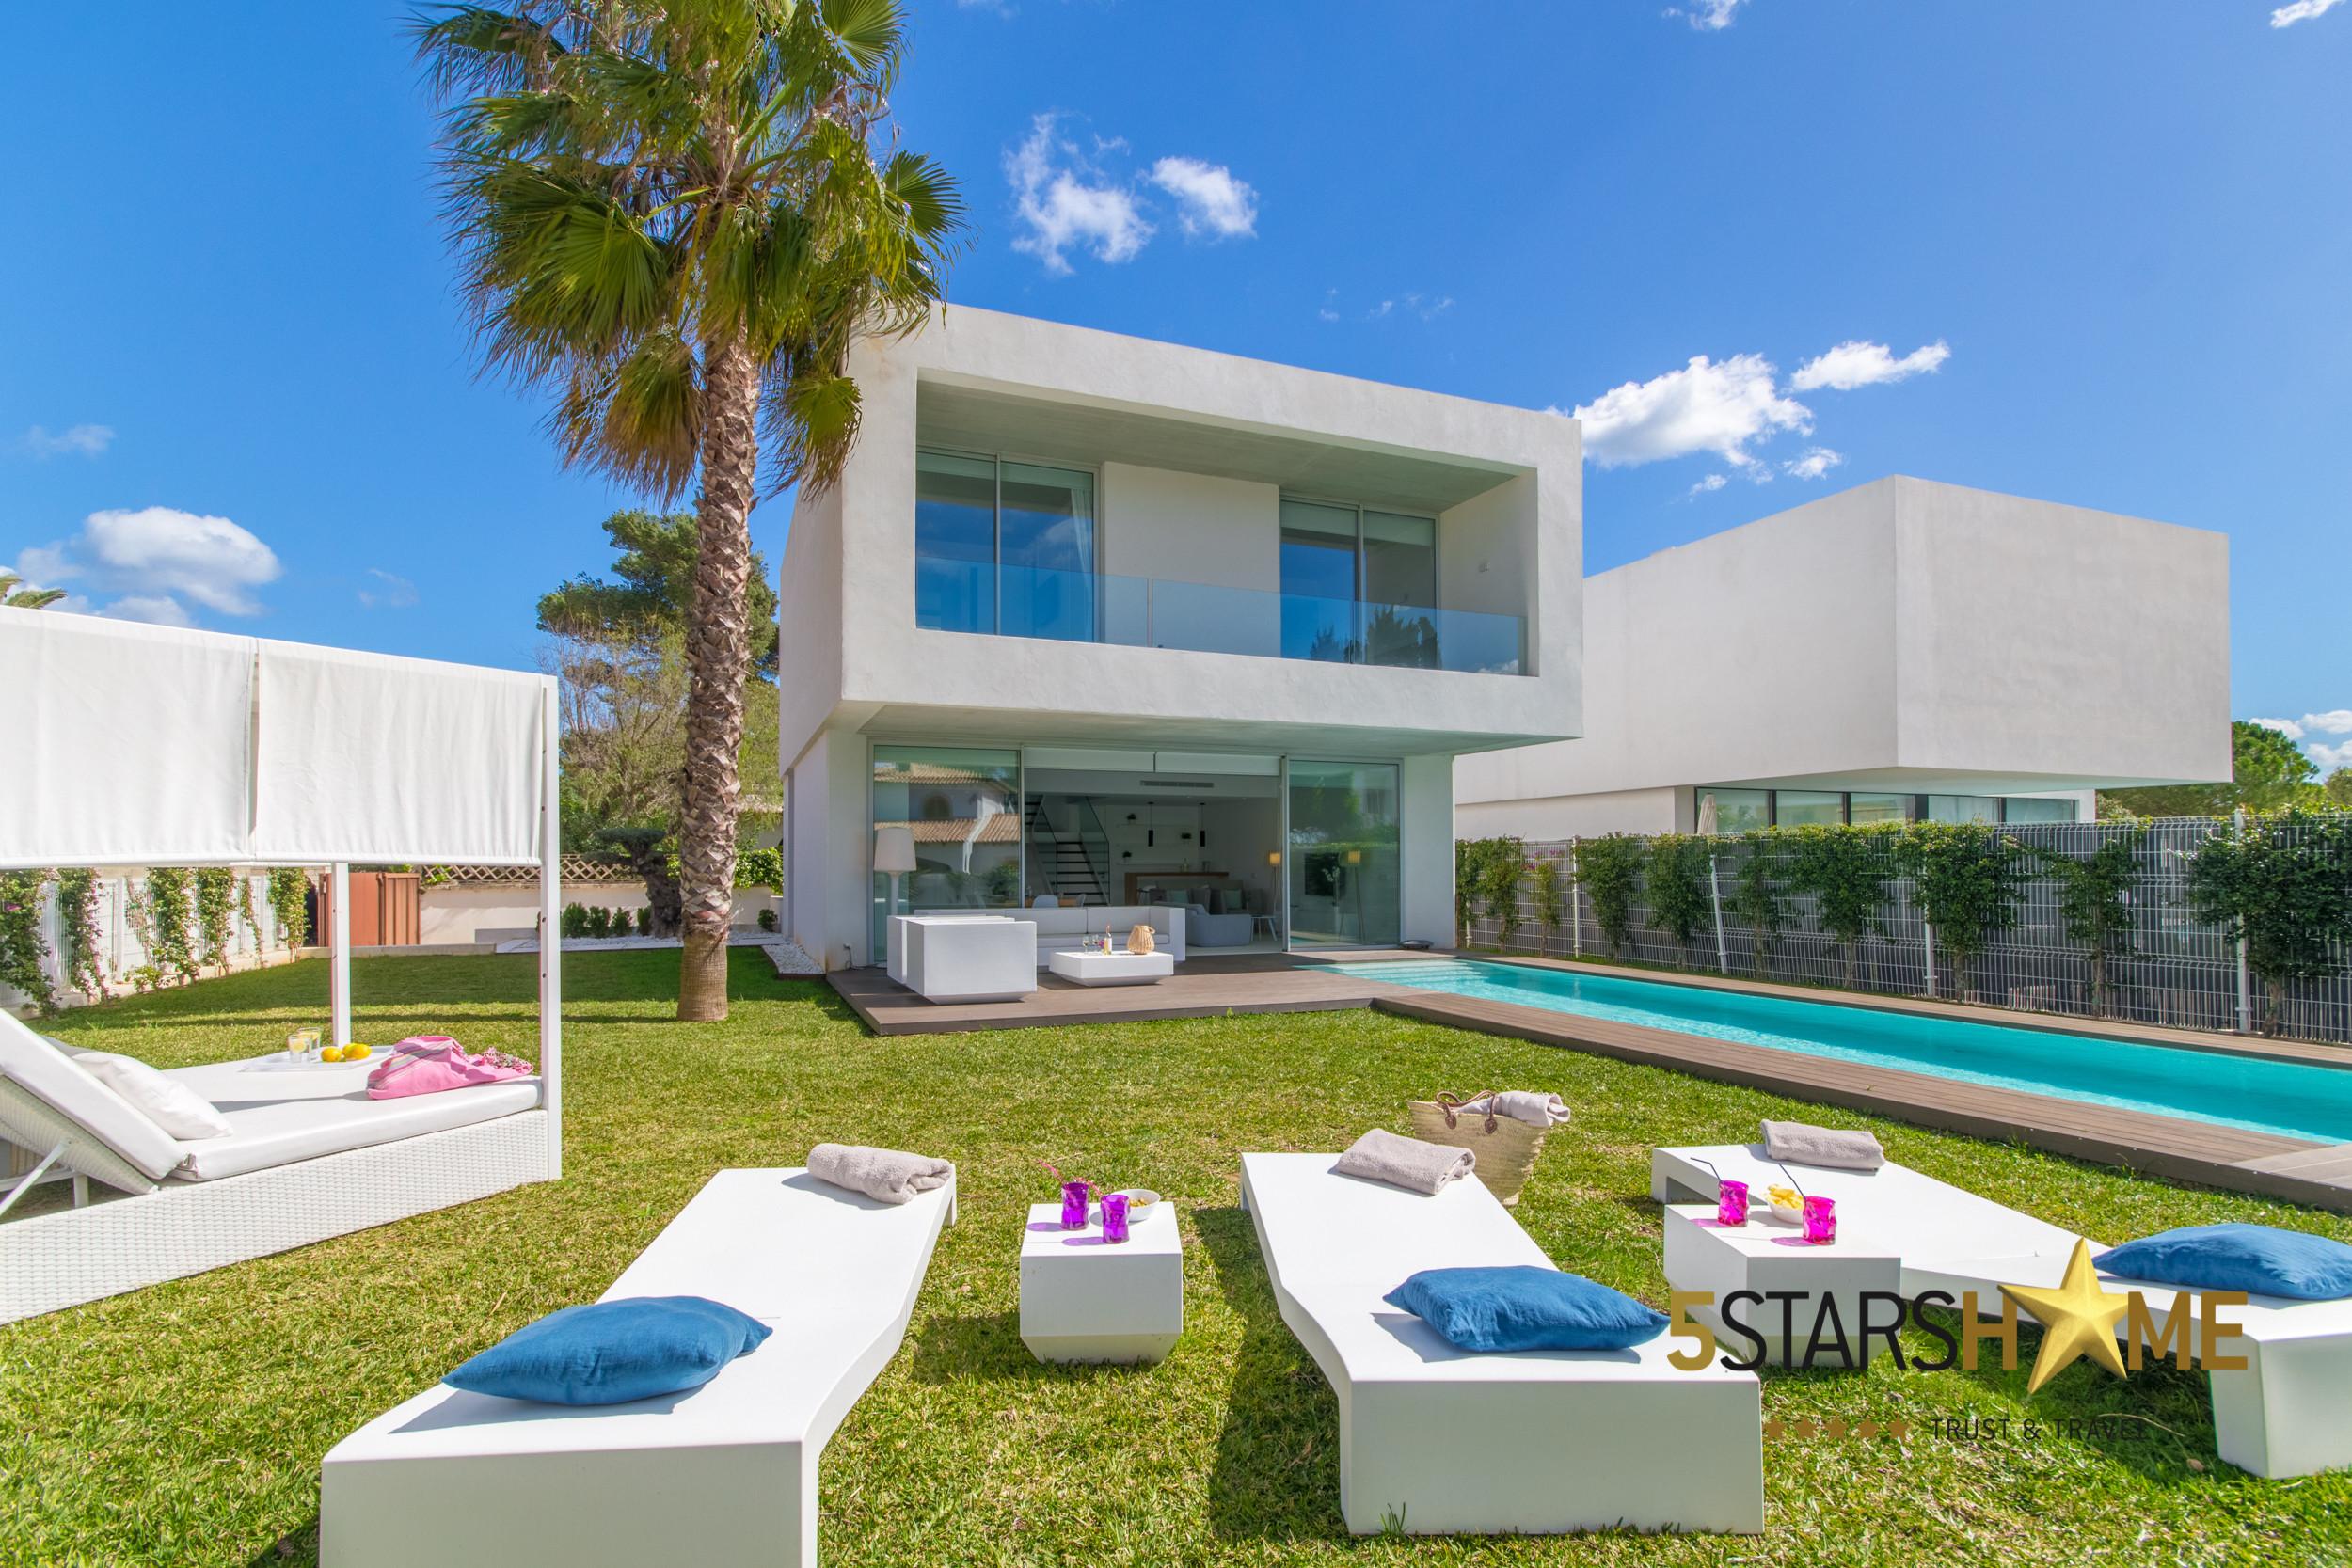 Cuc de Mar, Villa 5StarsHome Mallorca